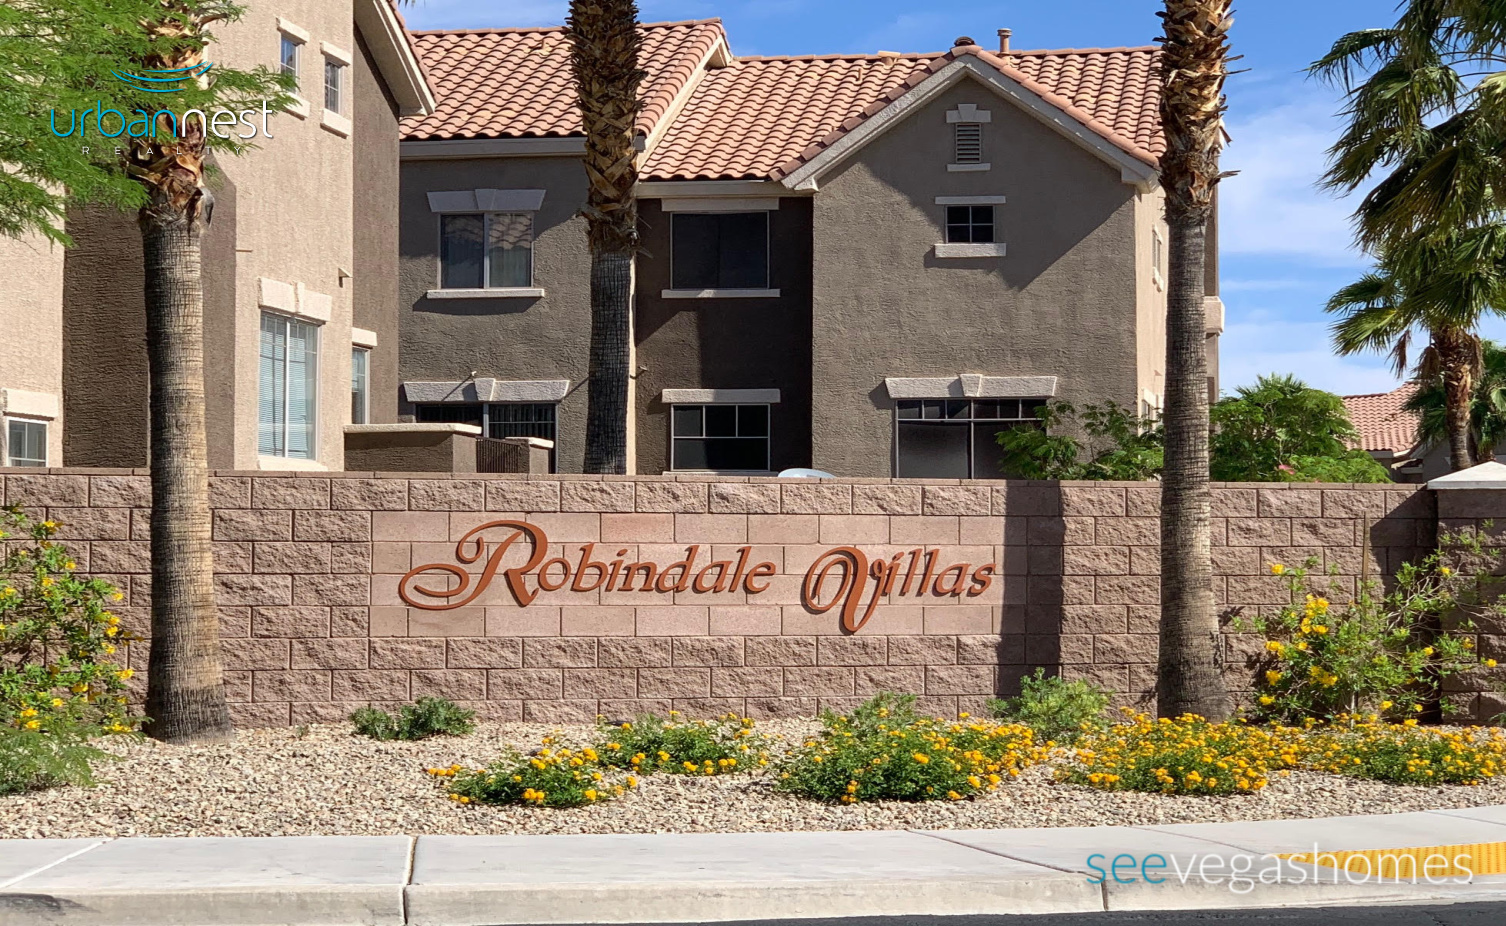 Robindale_Villas_Townhomes_Henderson_NV_89074_SeeVegasHomes